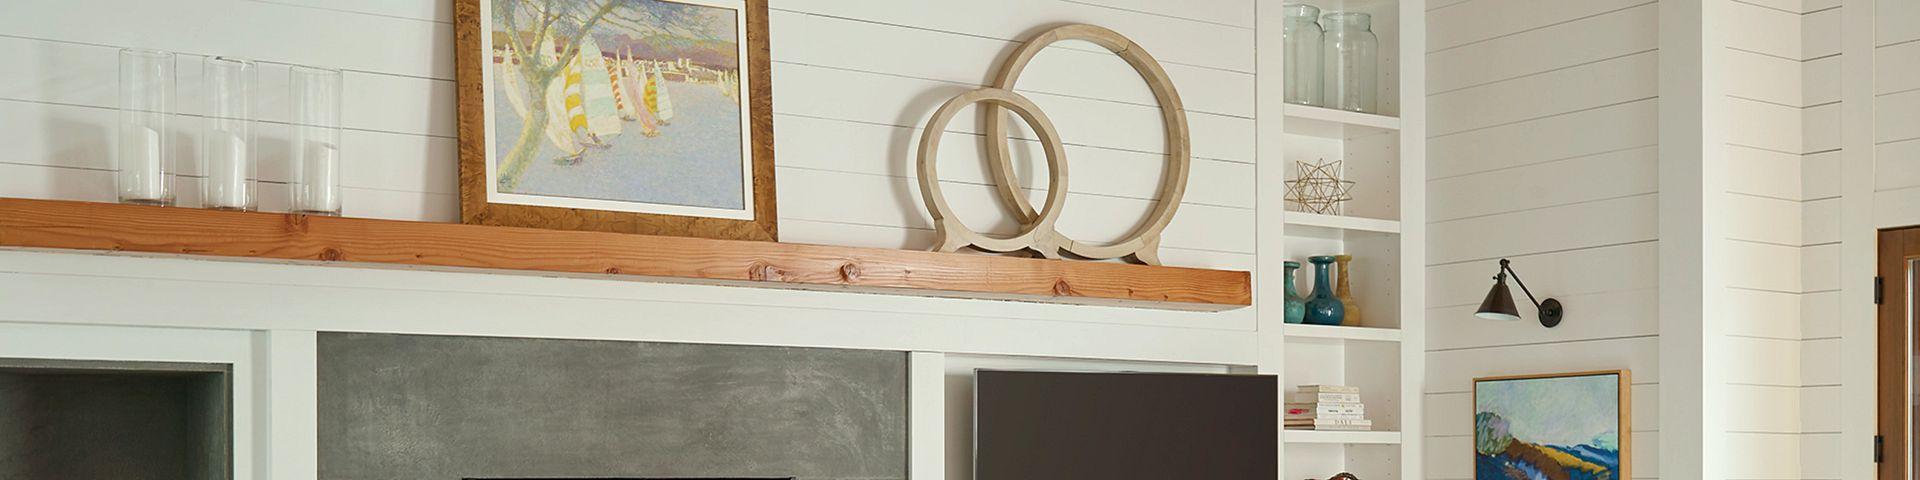 Hardwood-WaywardHickory-403TB-07072-Shearling-Living-Room-2020